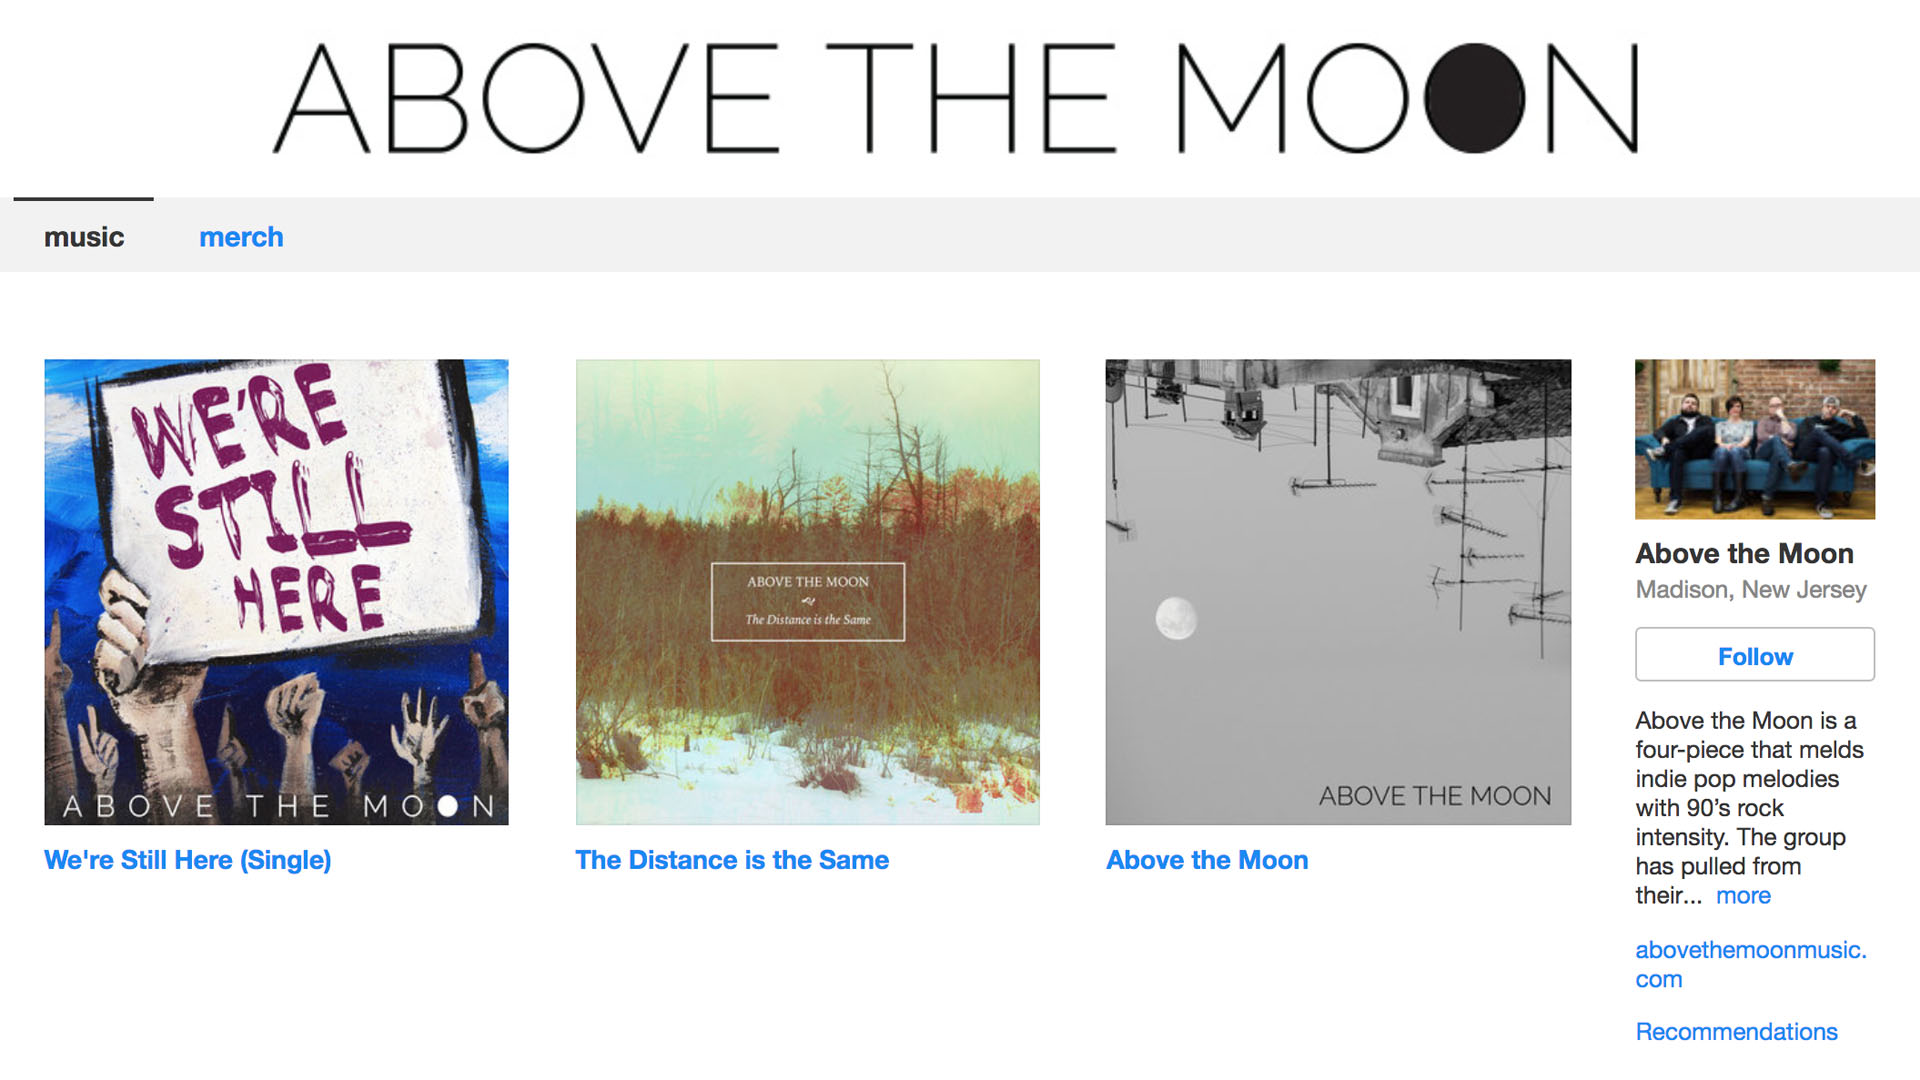 abovethemoon.bandcamp.com